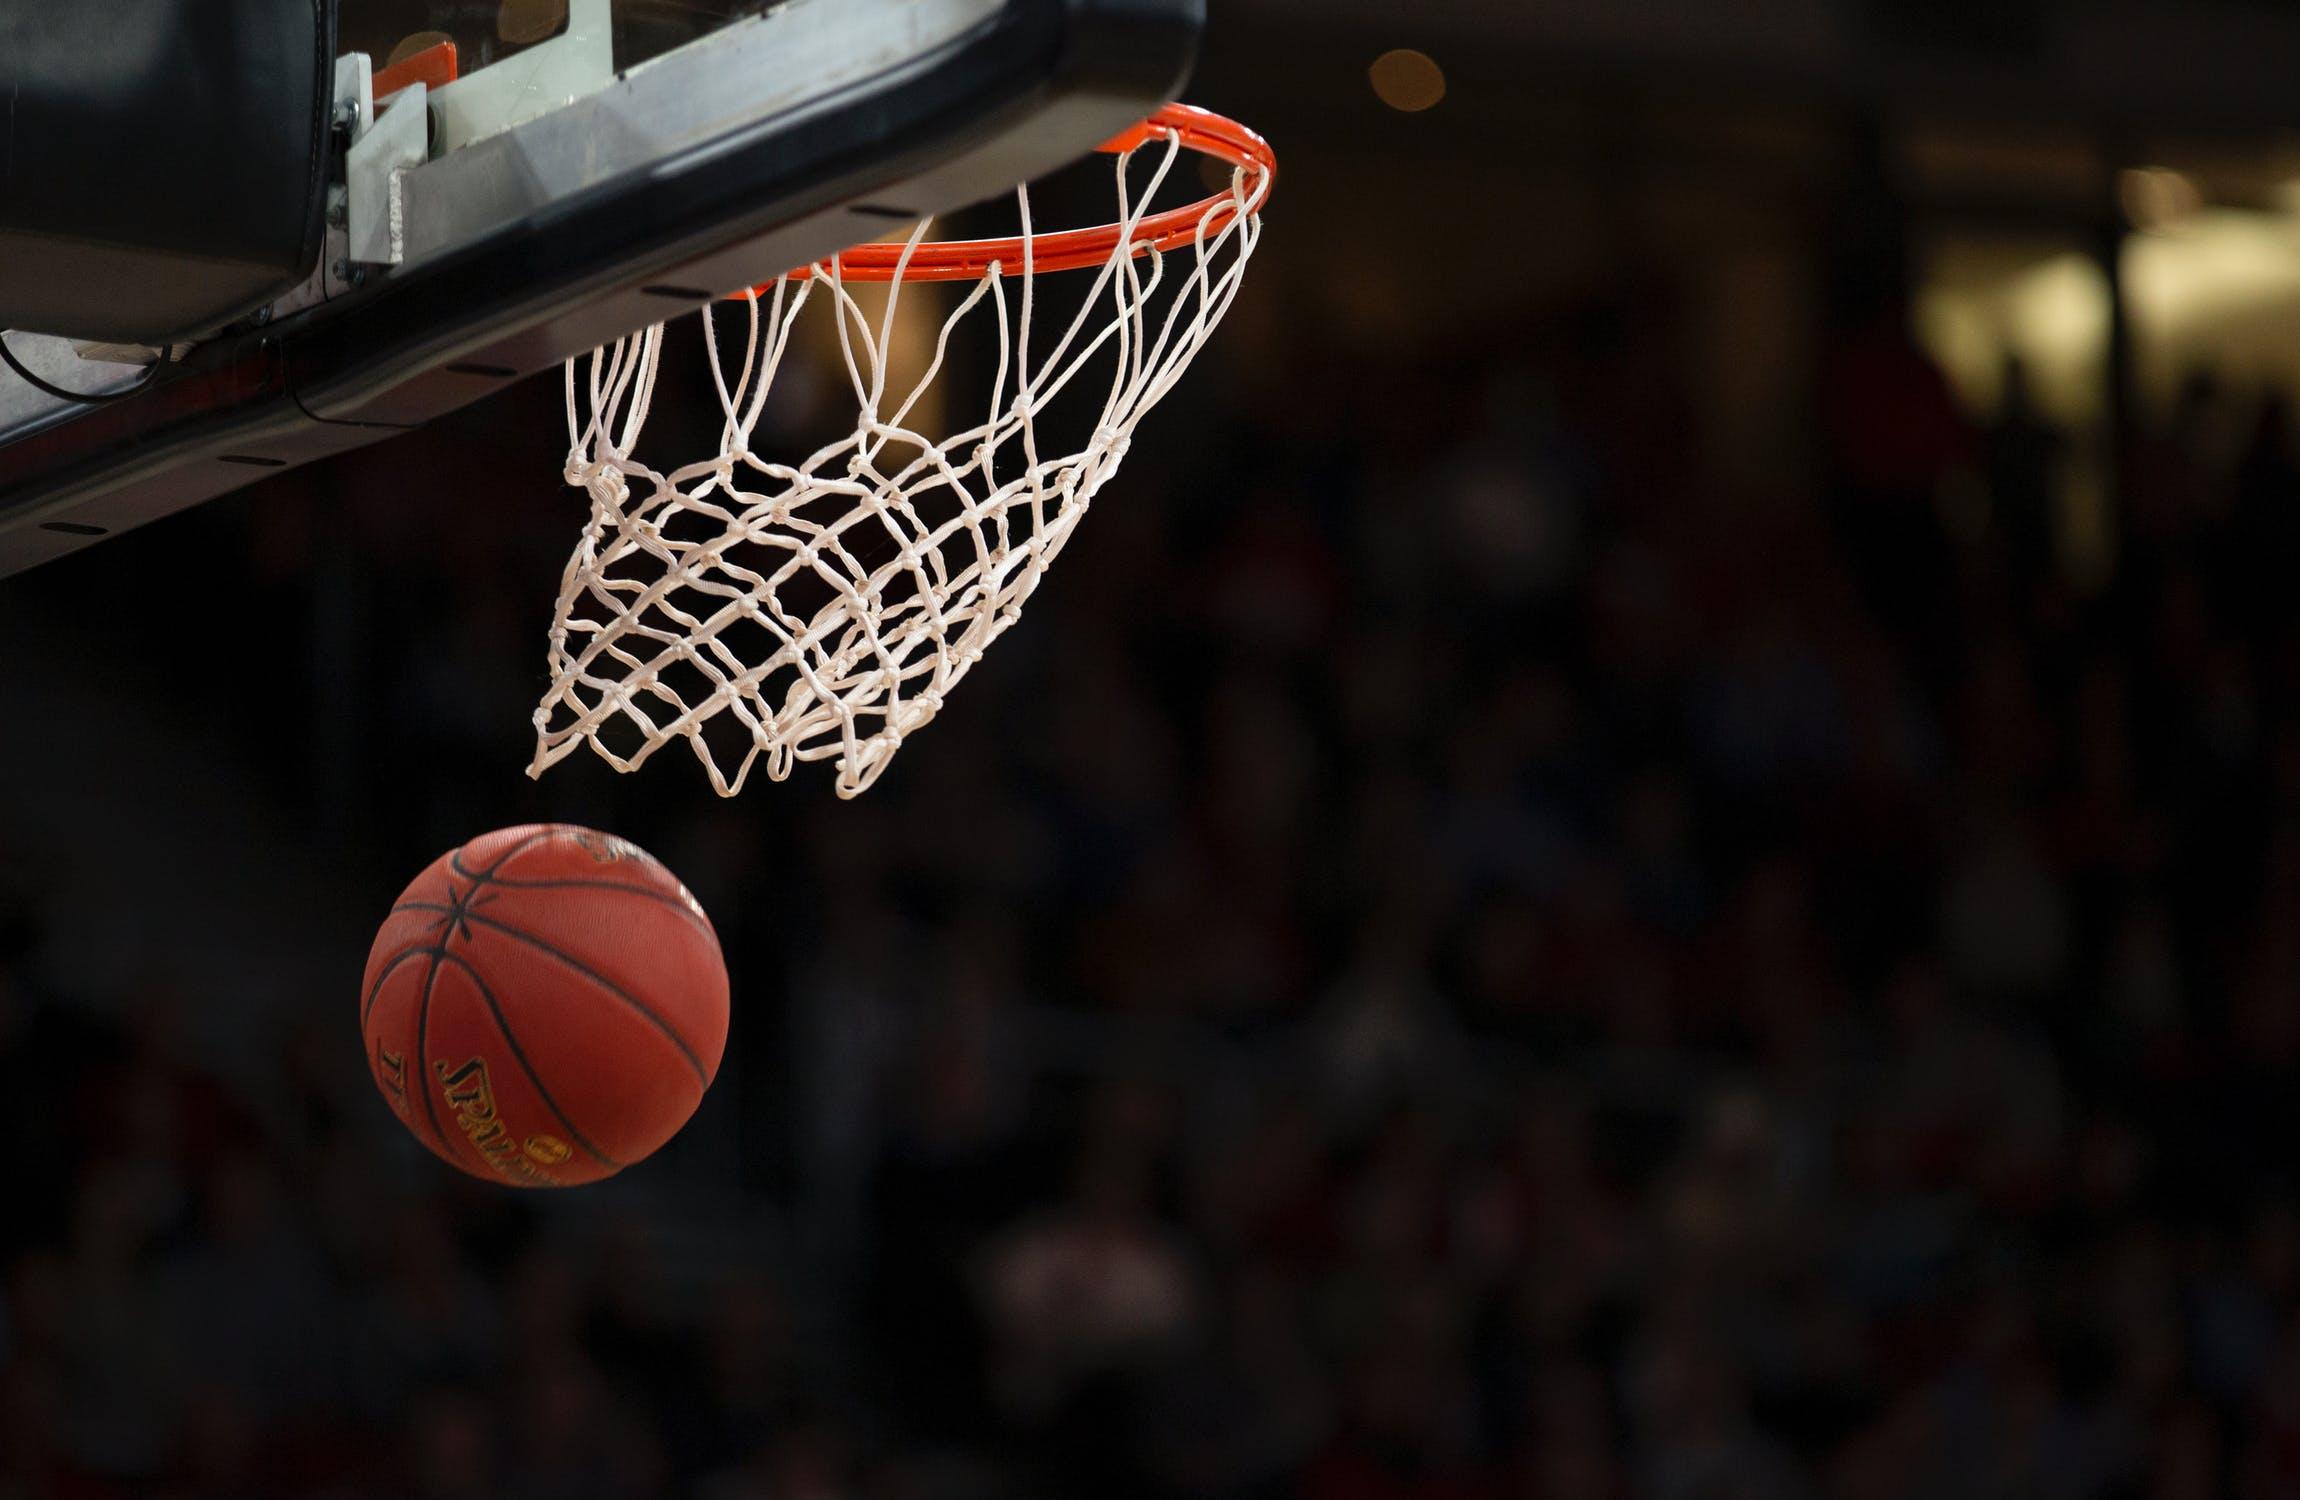 Canestro con palla da basket